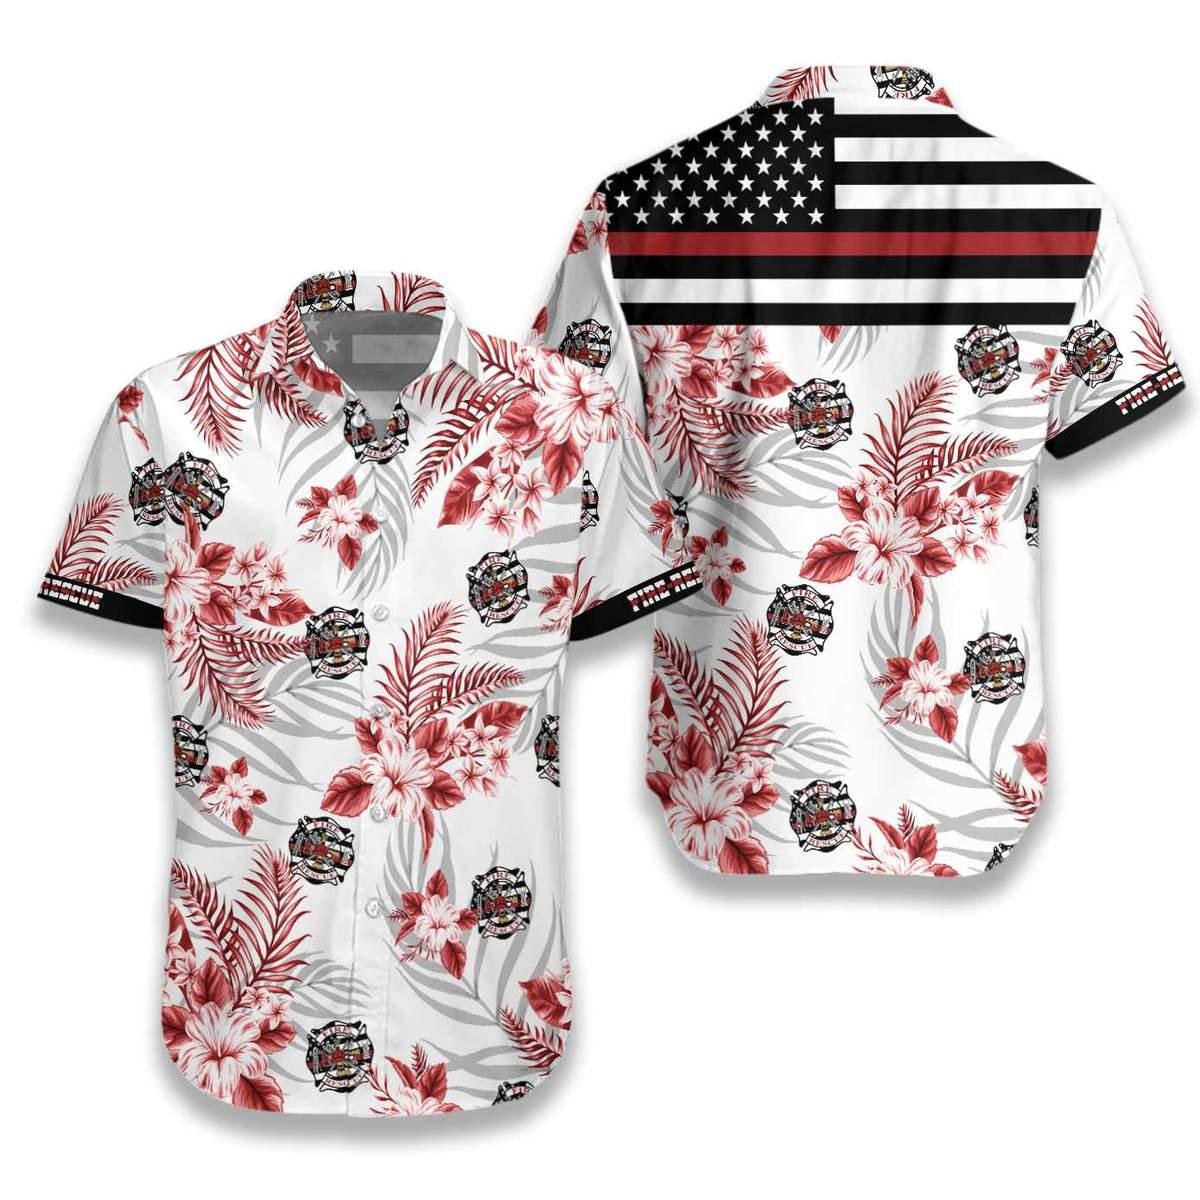 The Red Line Flag Firefighter Hawaiian Shirt1